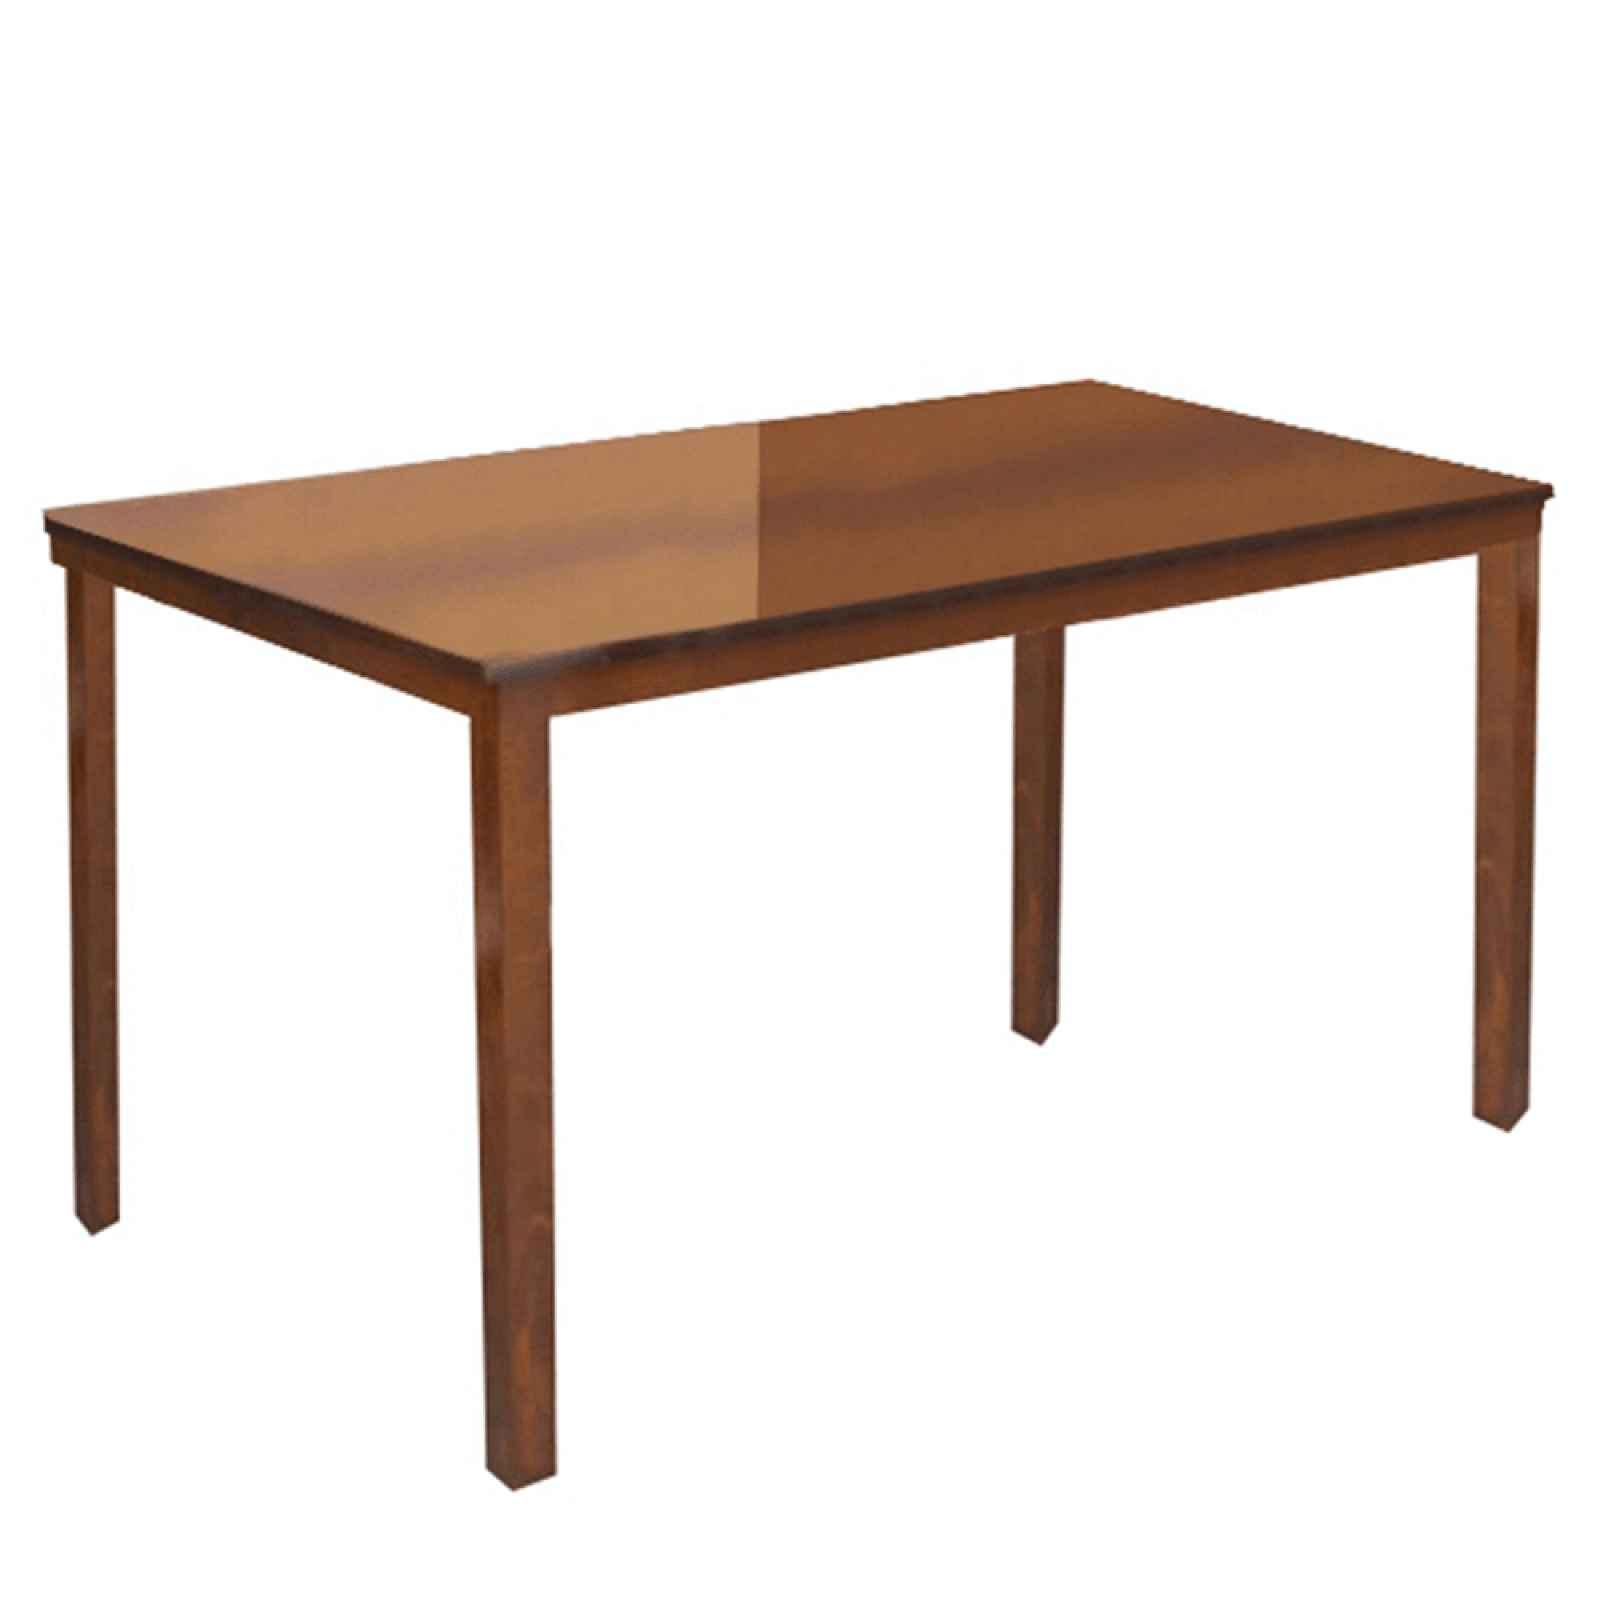 Stůl 110, ořech, ASTRO 0000203051 Tempo Kondela